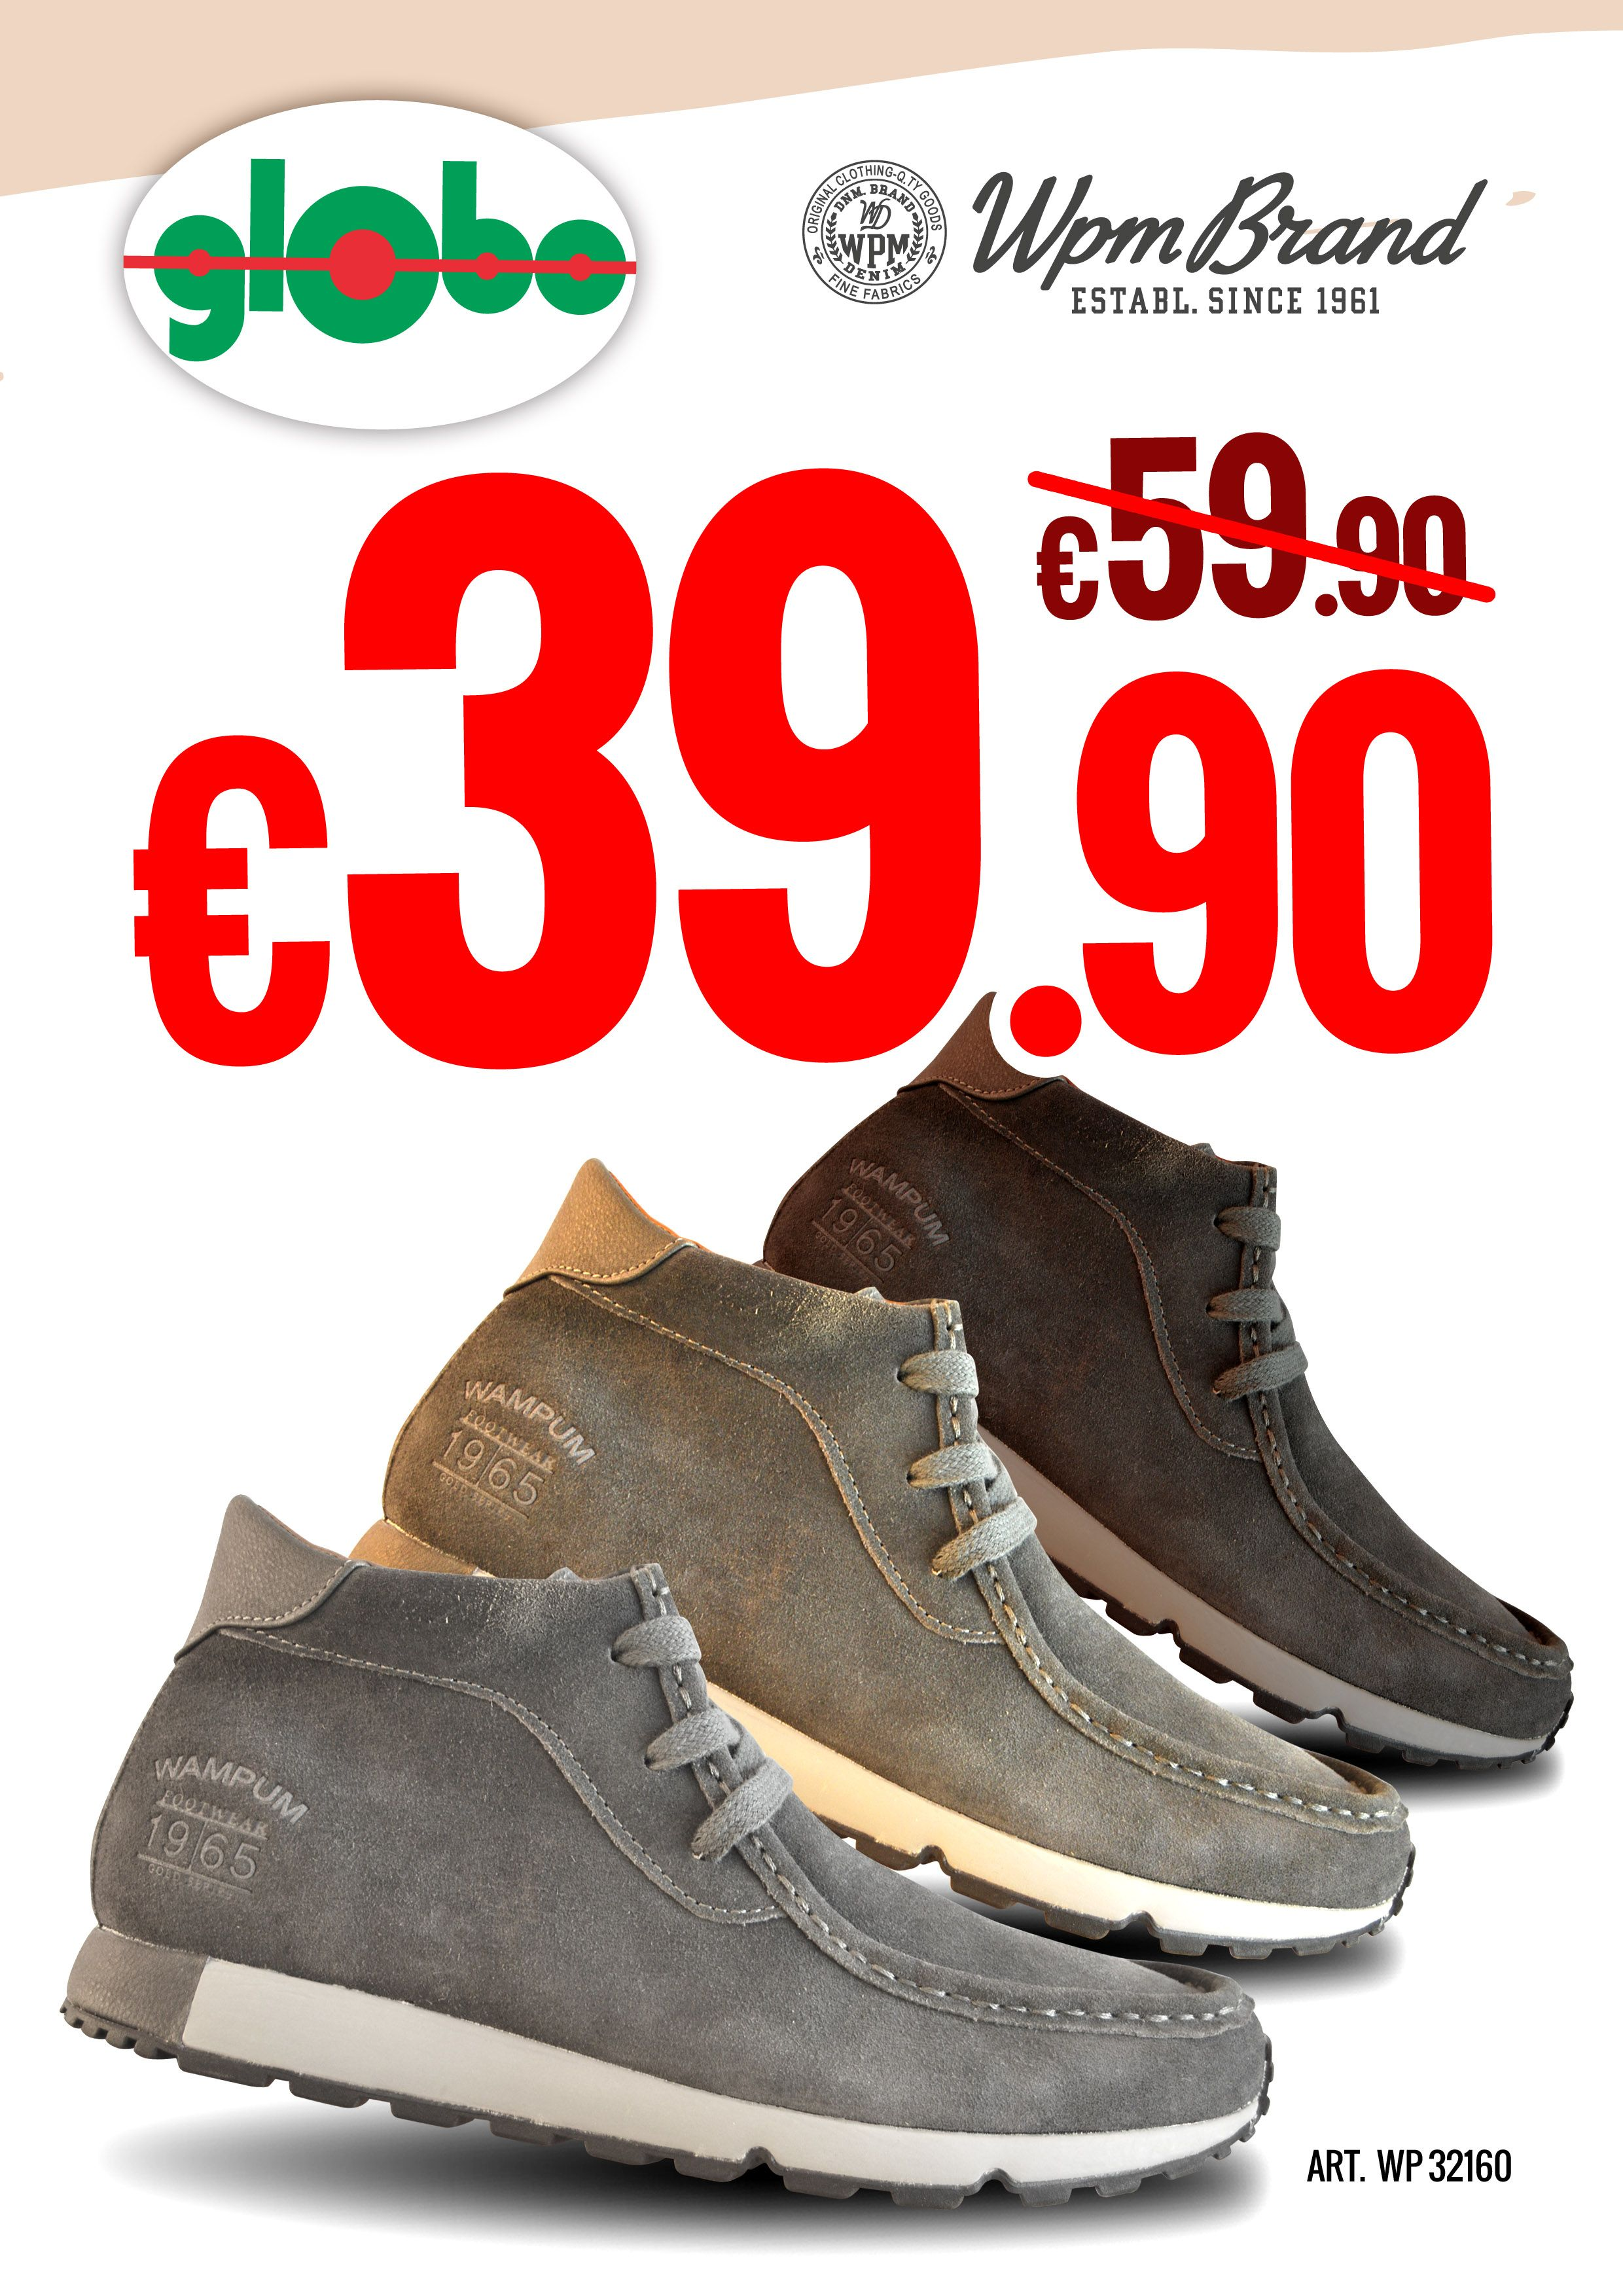 wholesale dealer 044e9 48ff8 Novità Wampum a soli € 39,90   Globo Calzature   Globi